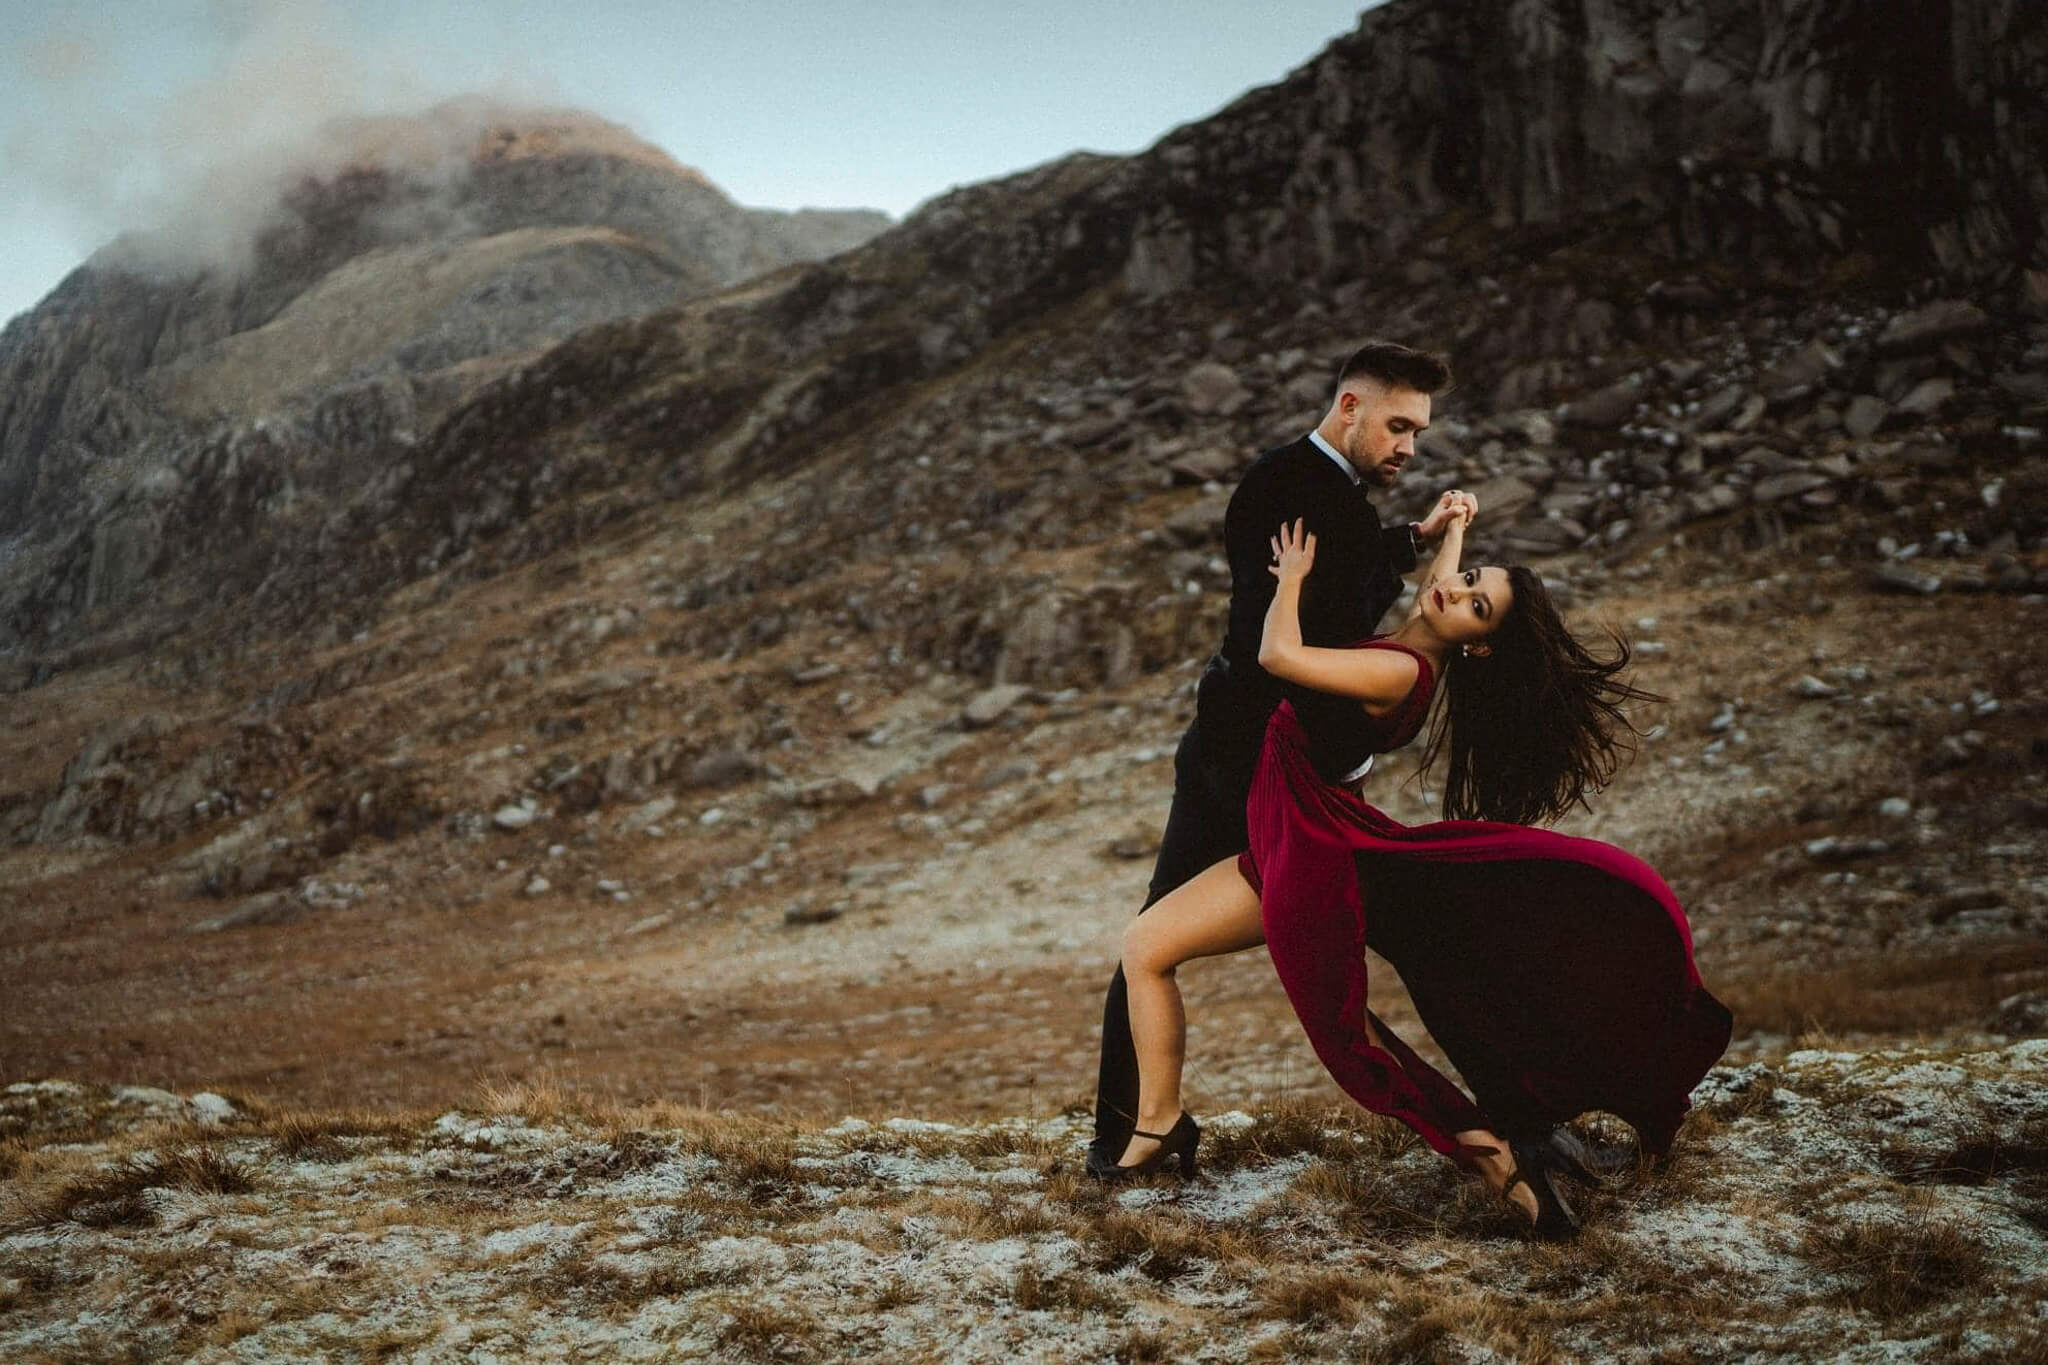 A stunning engagement photoshoot